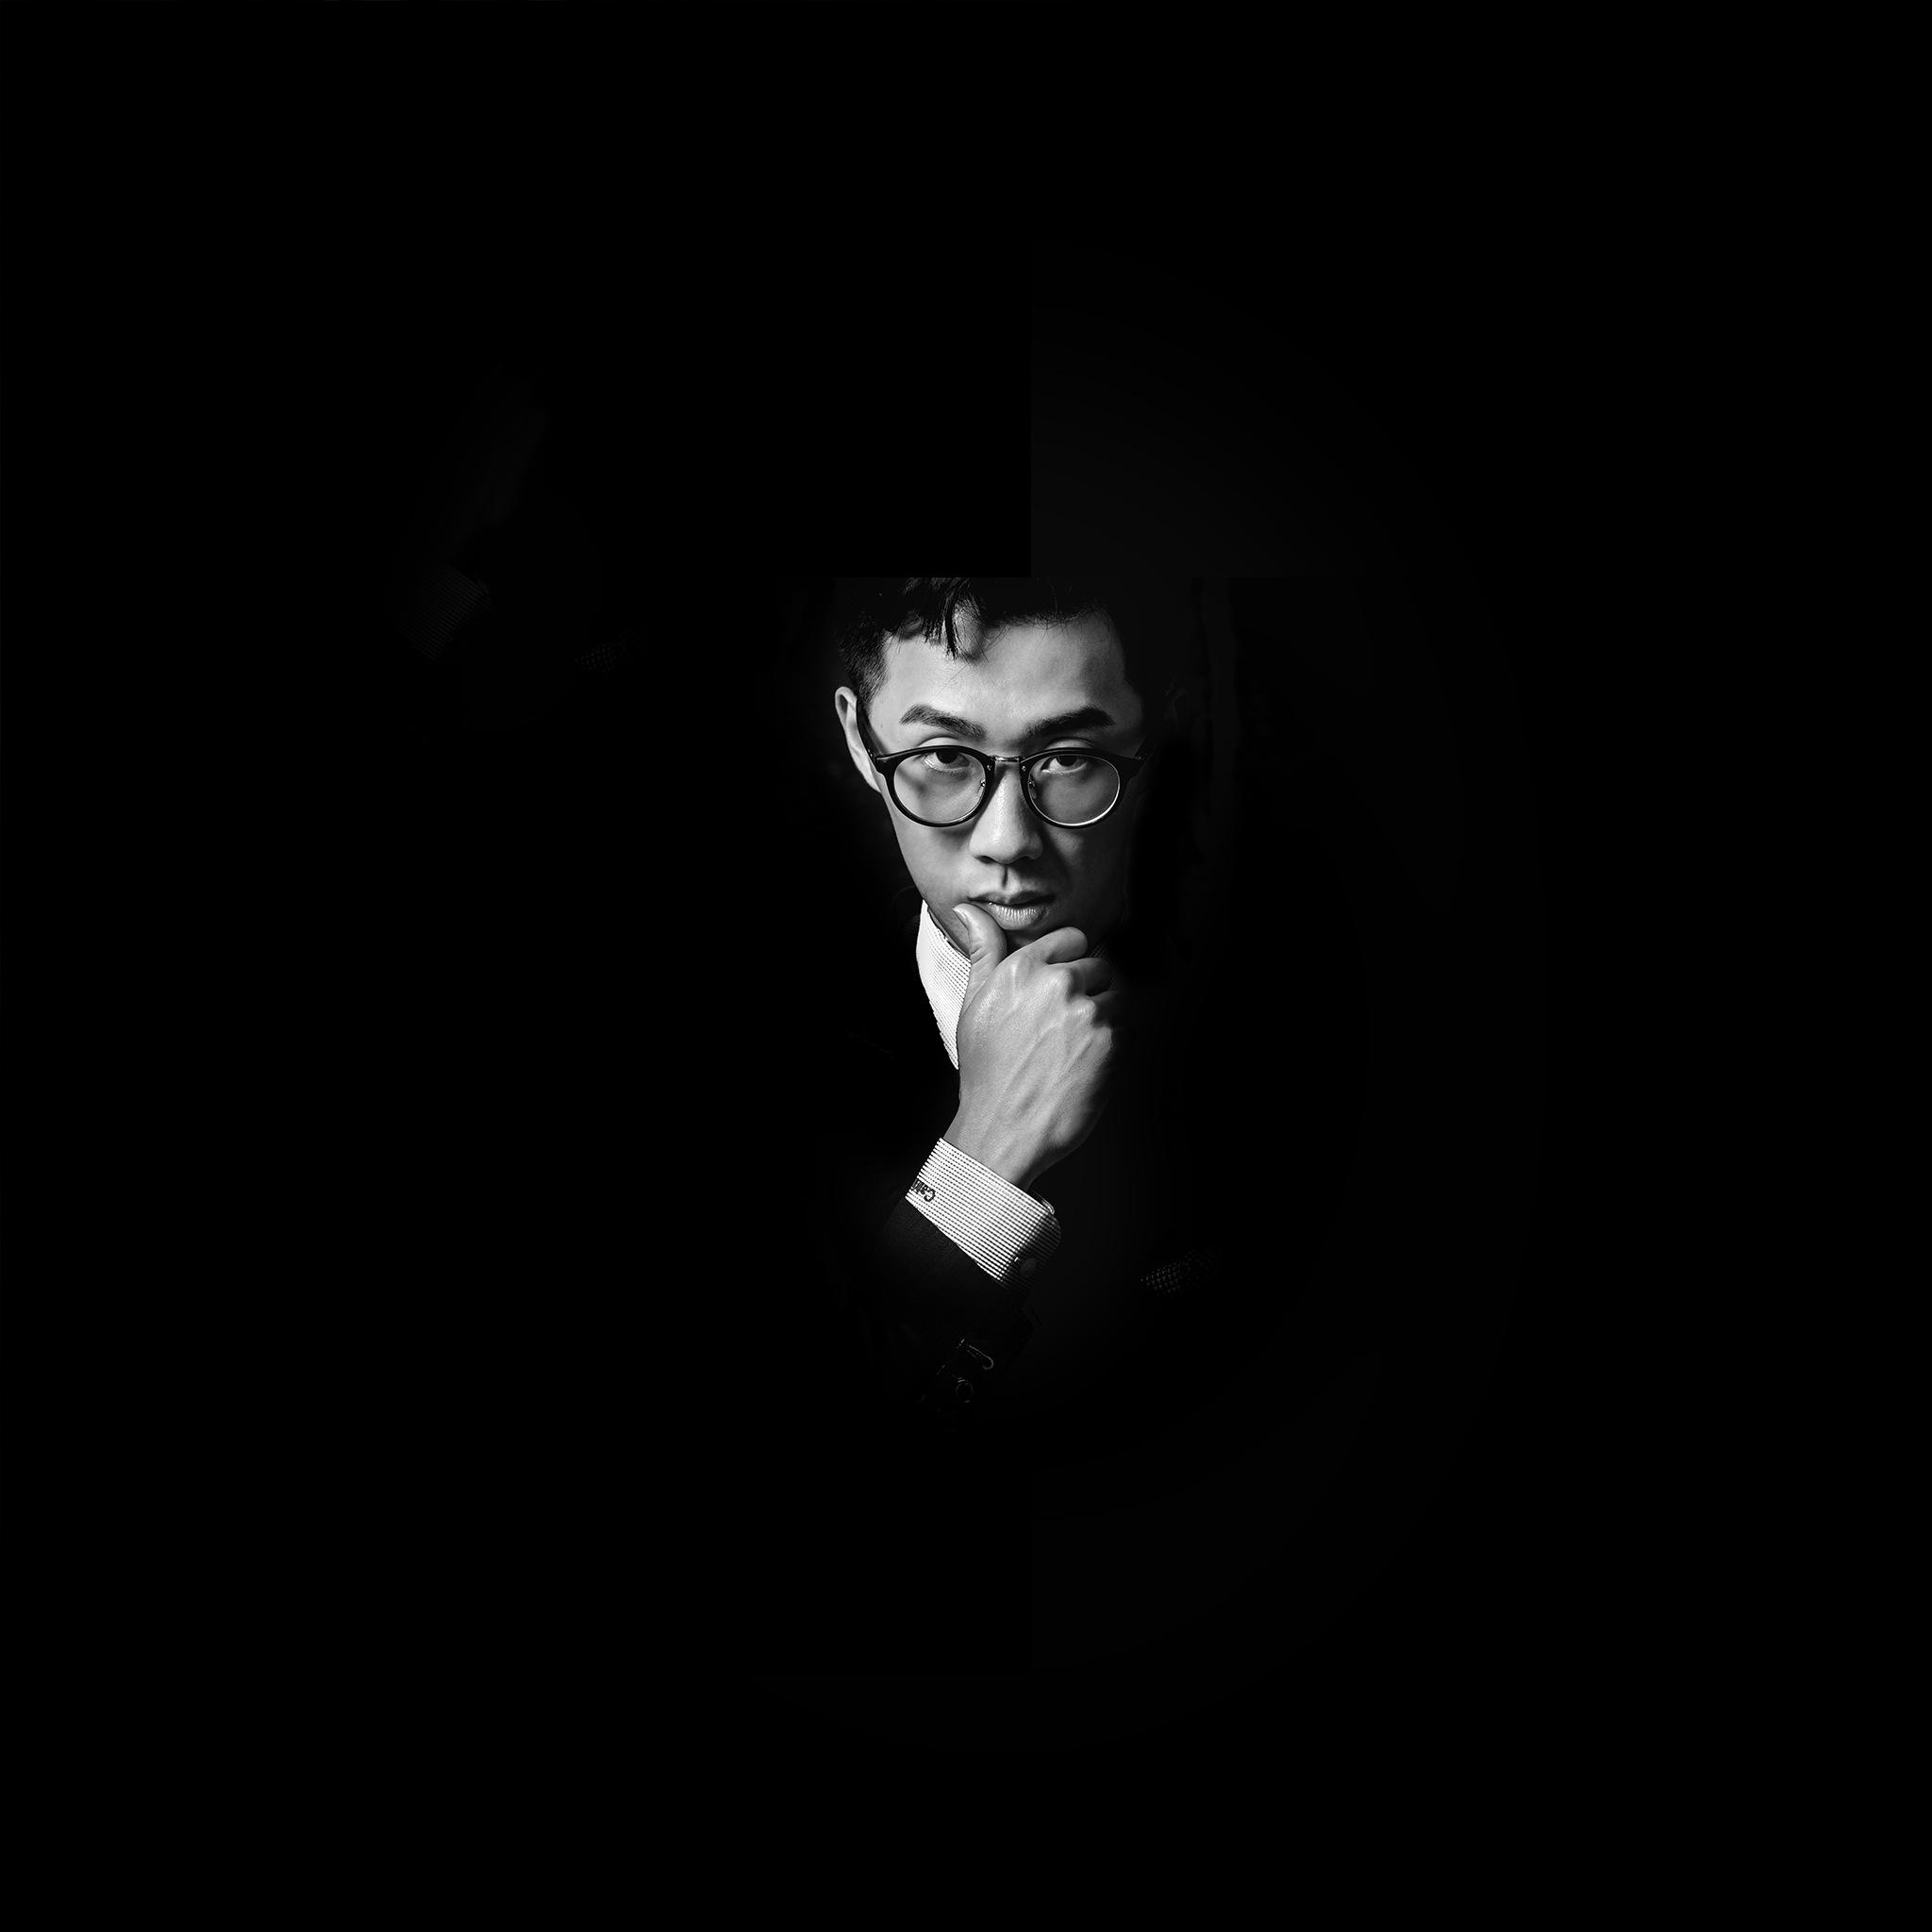 Untitled by Victor Liu